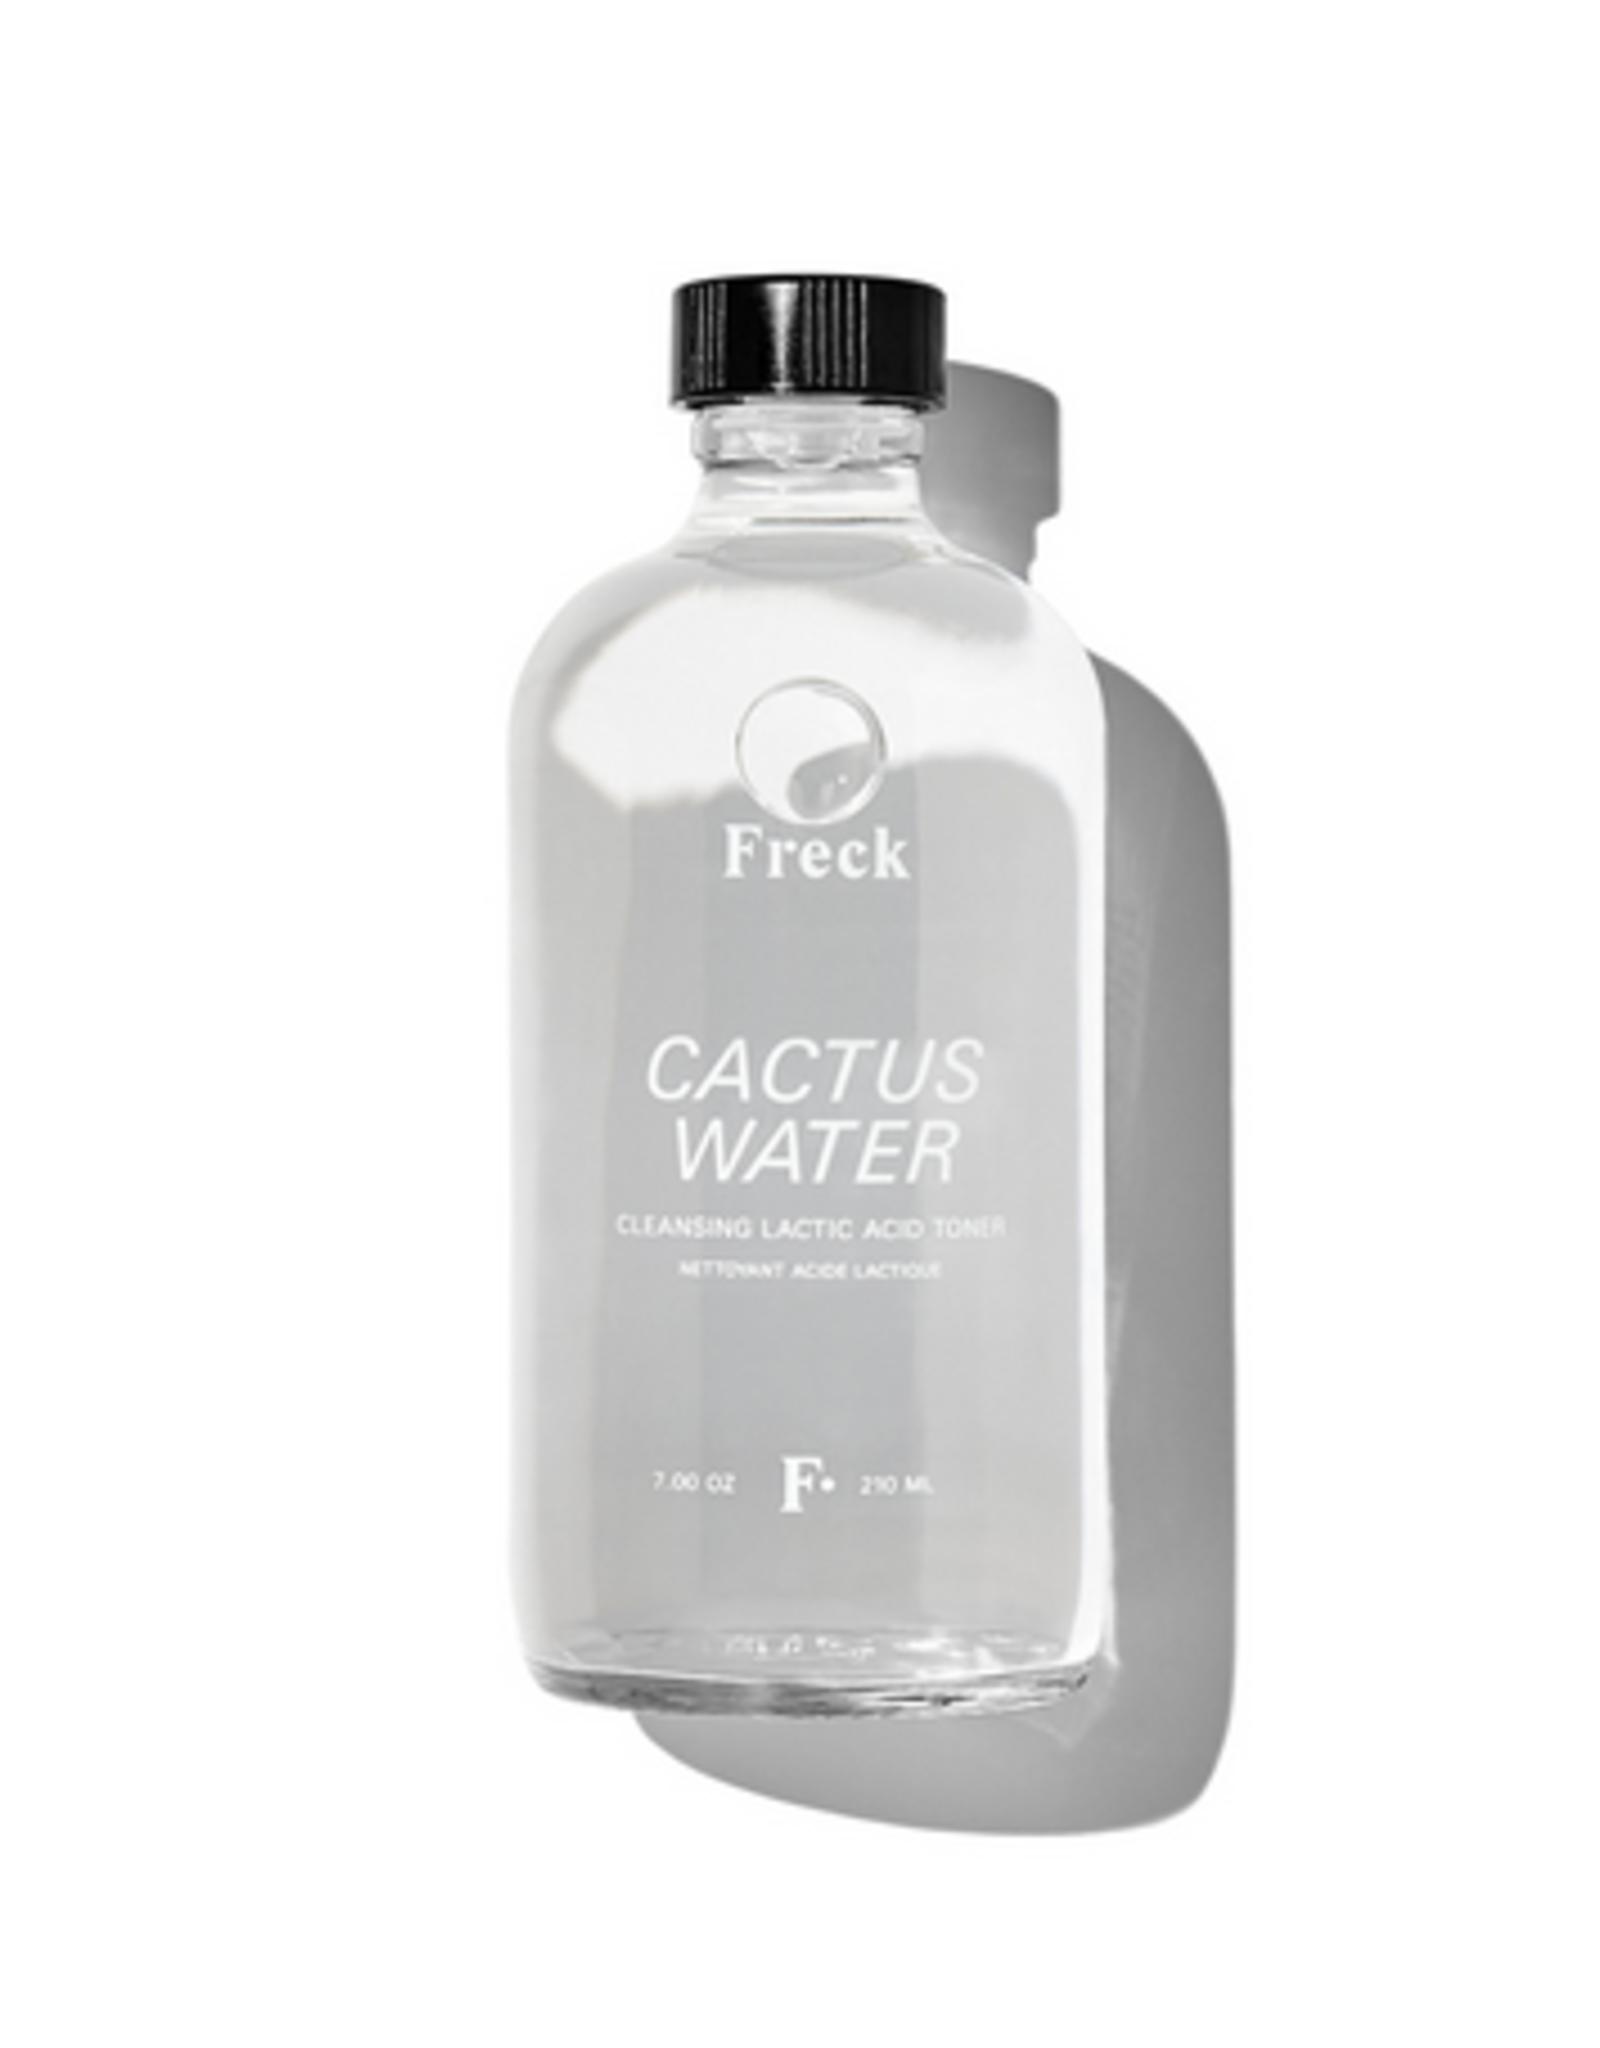 Cactus Water Cleansing Lactic Acid Toner